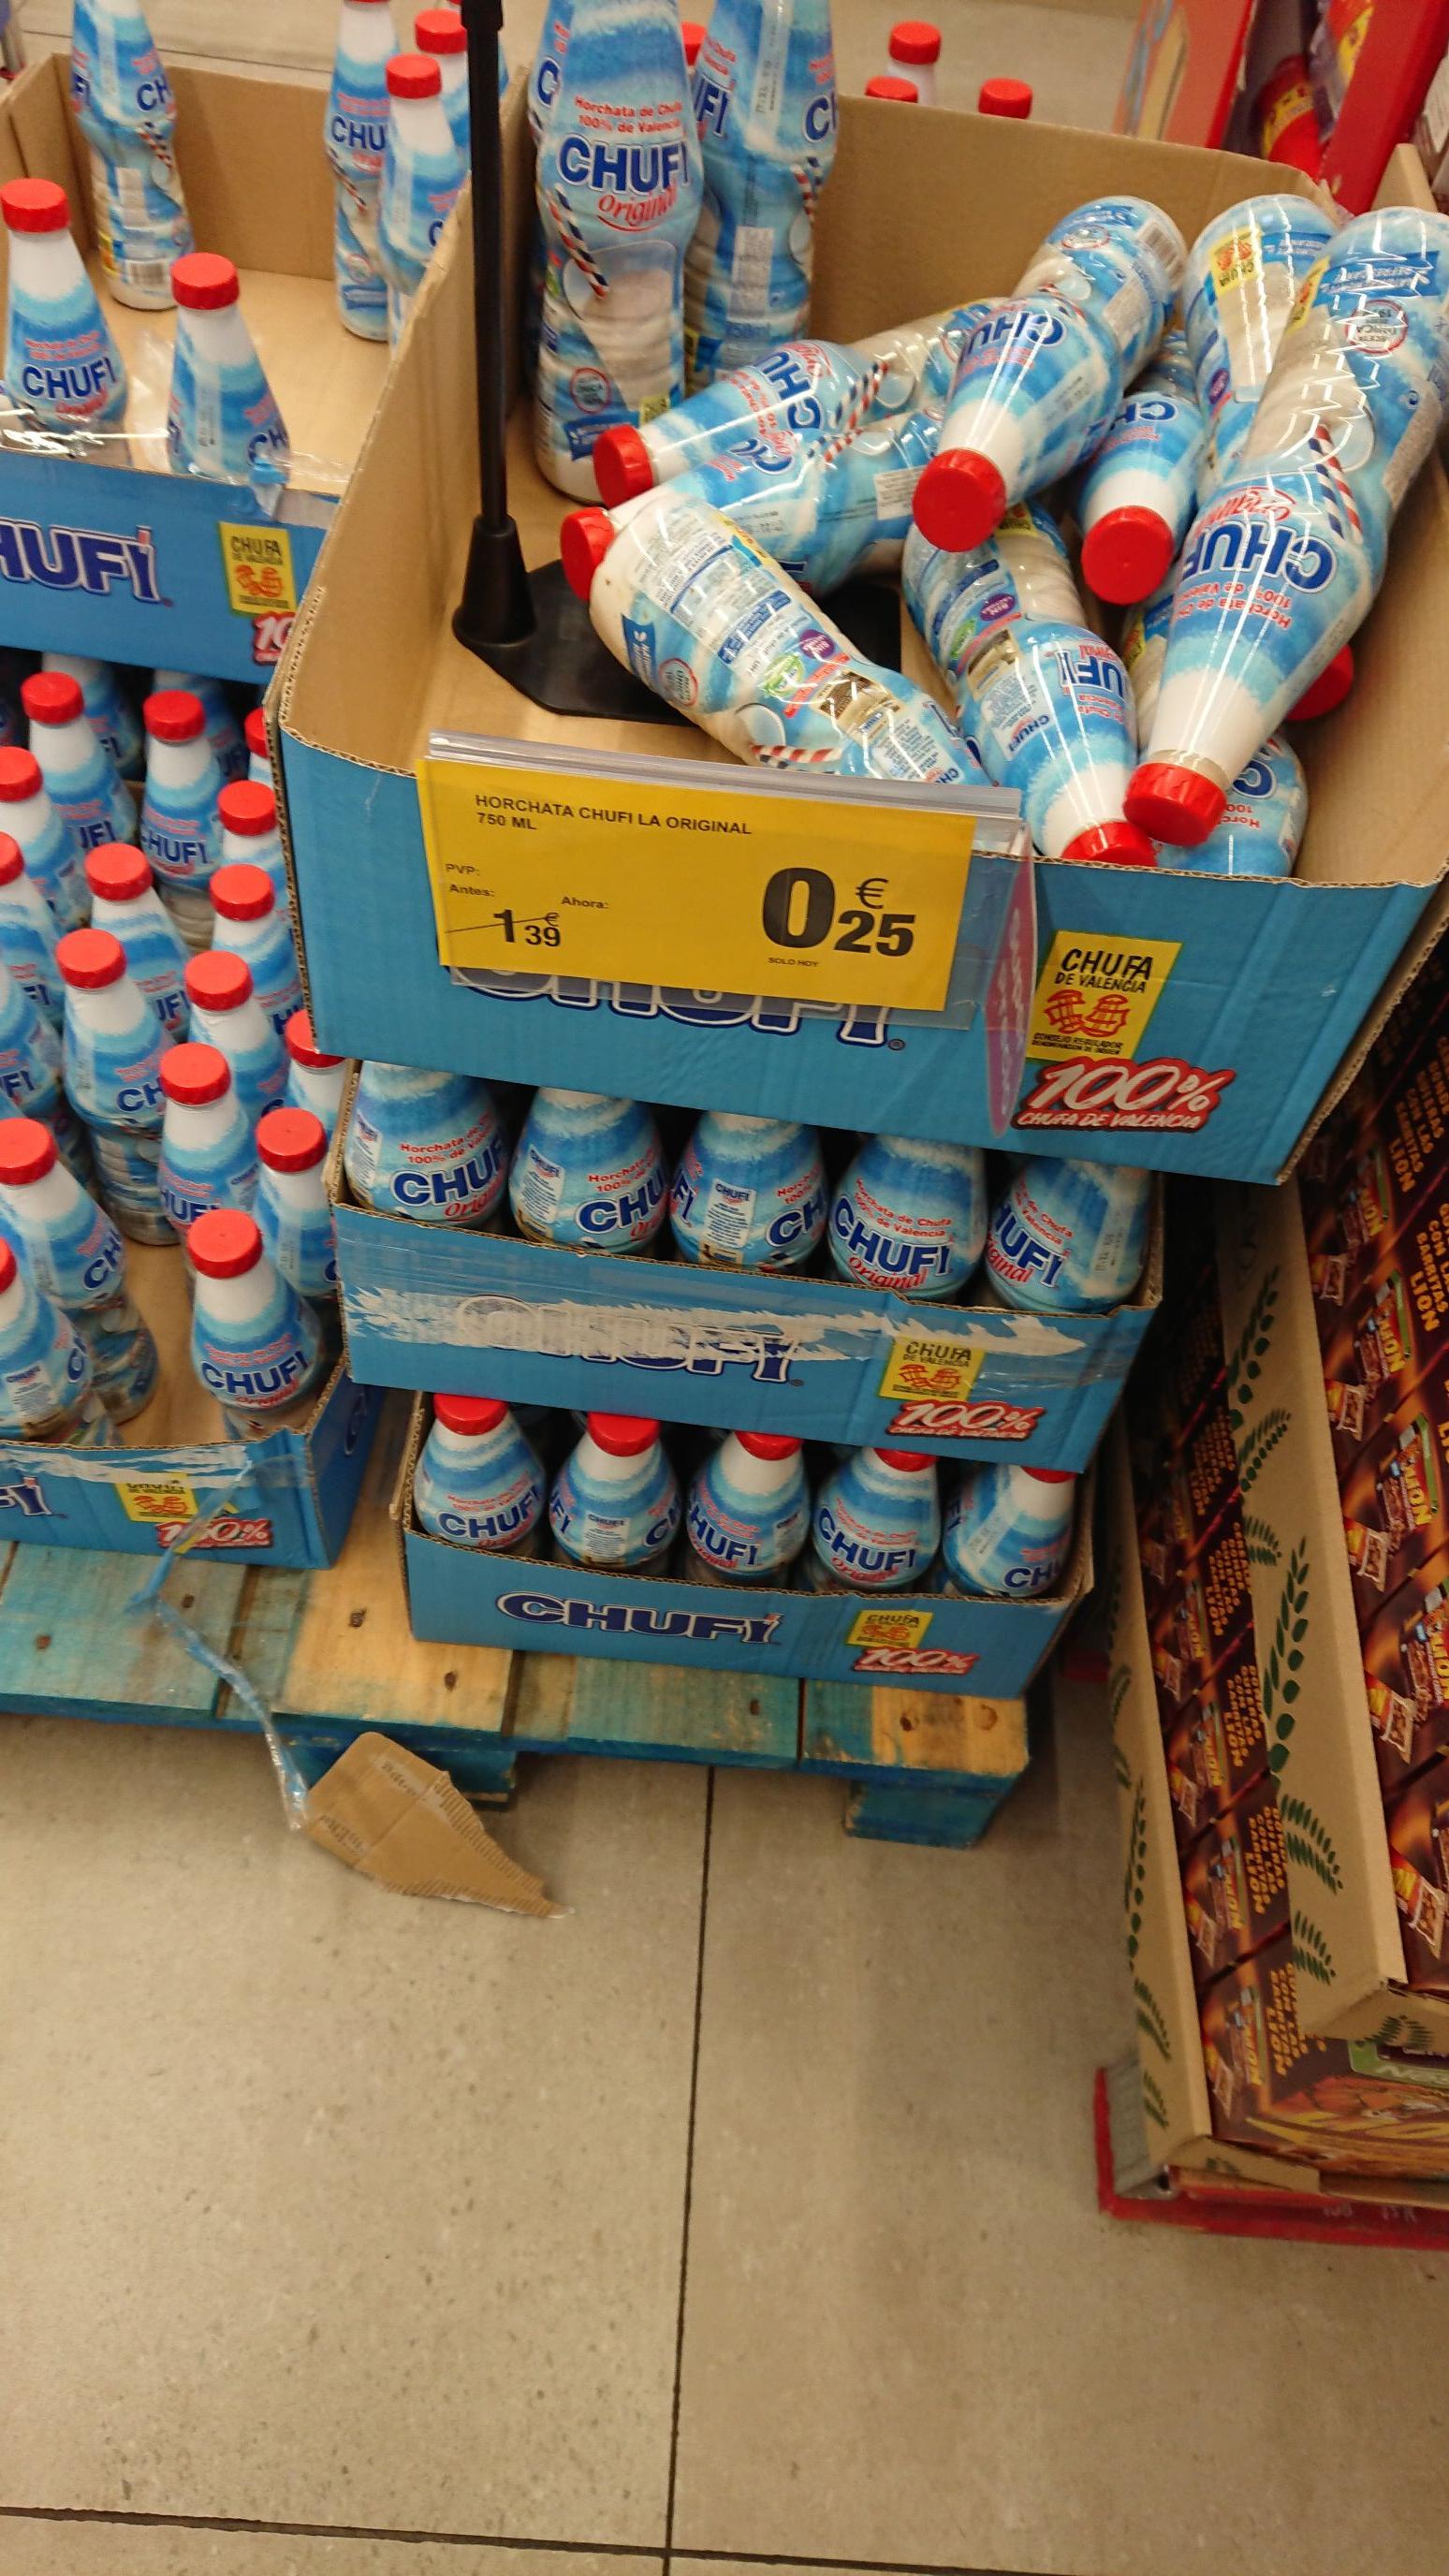 Horchata Chufi 750ml por 0.25€ (Carrefour Finestrat, Alicante)